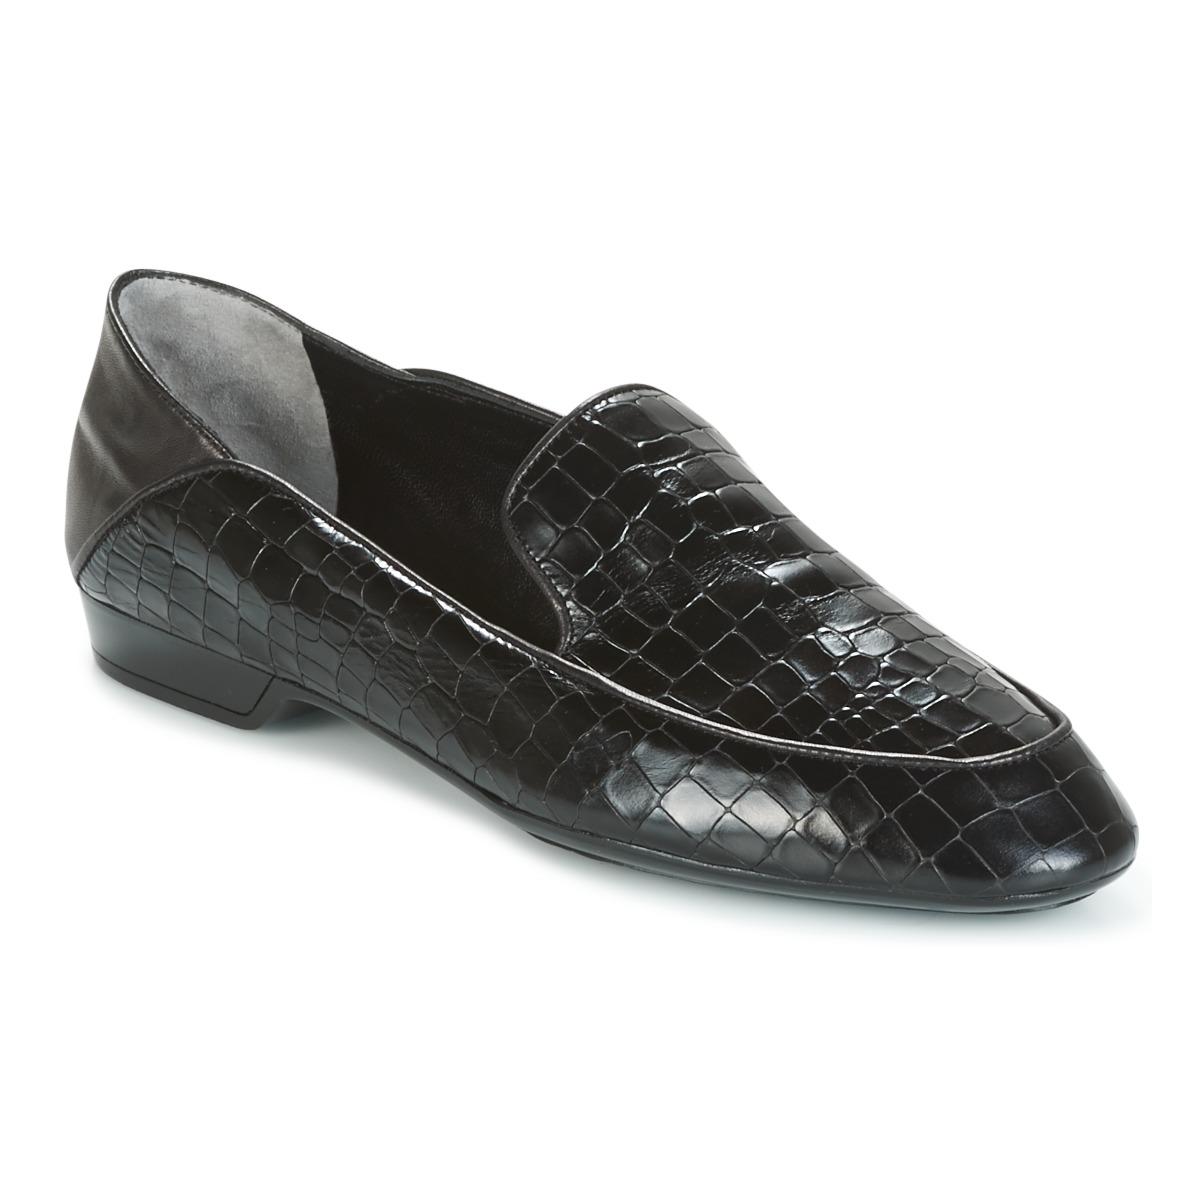 Loafers Robert Clergerie  FANIN-COCCO-AGNEAU-NOIR